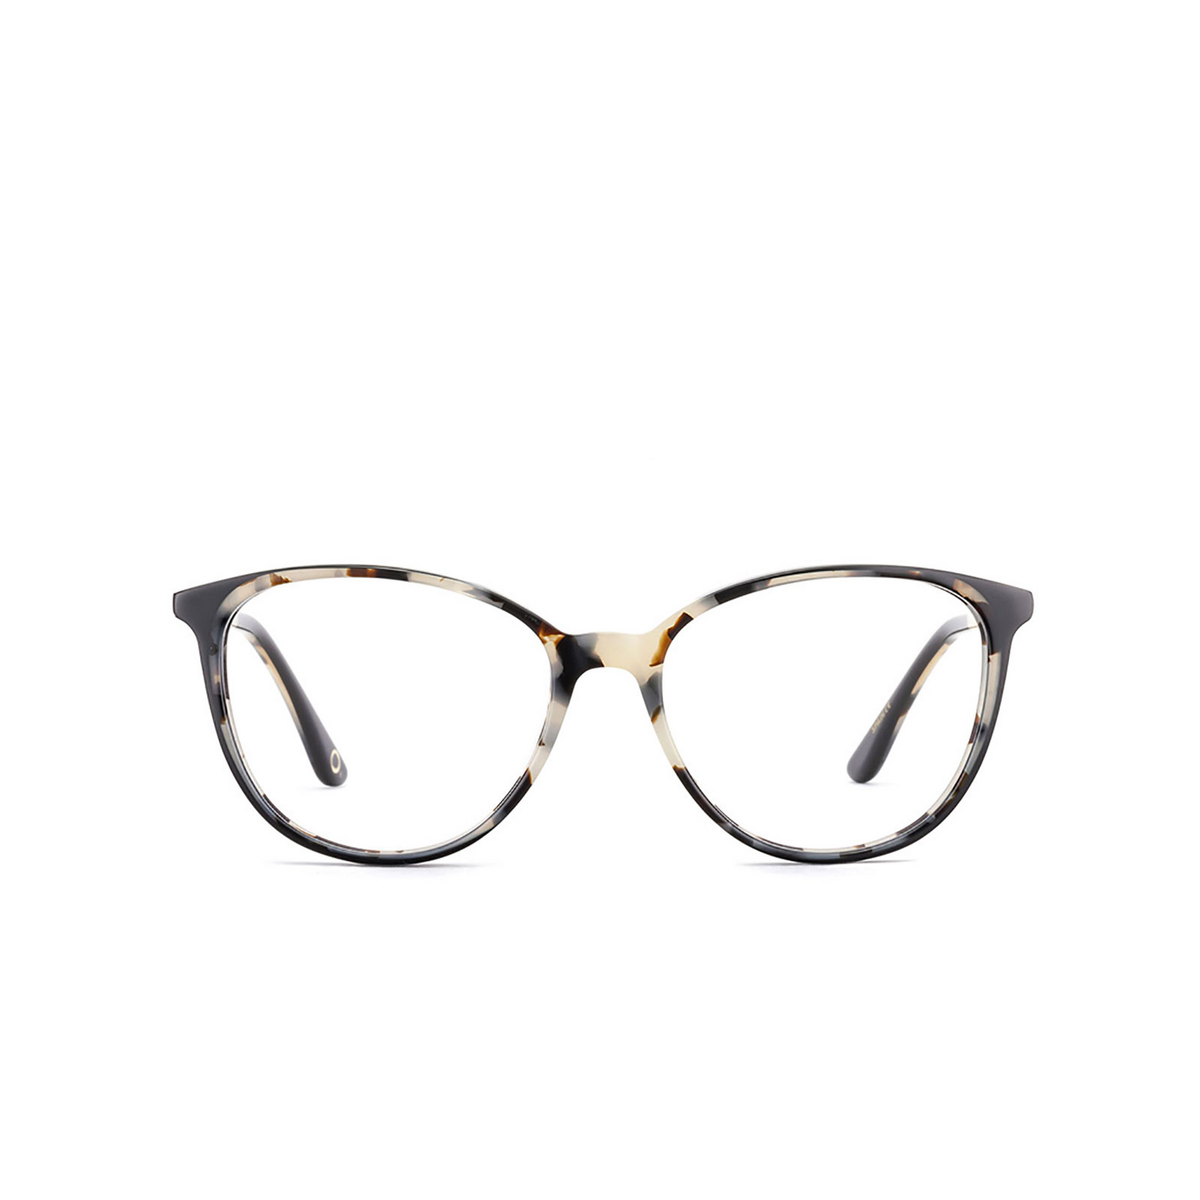 Etnia Barcelona® Butterfly Eyeglasses: Marie color Hvbk - front view.